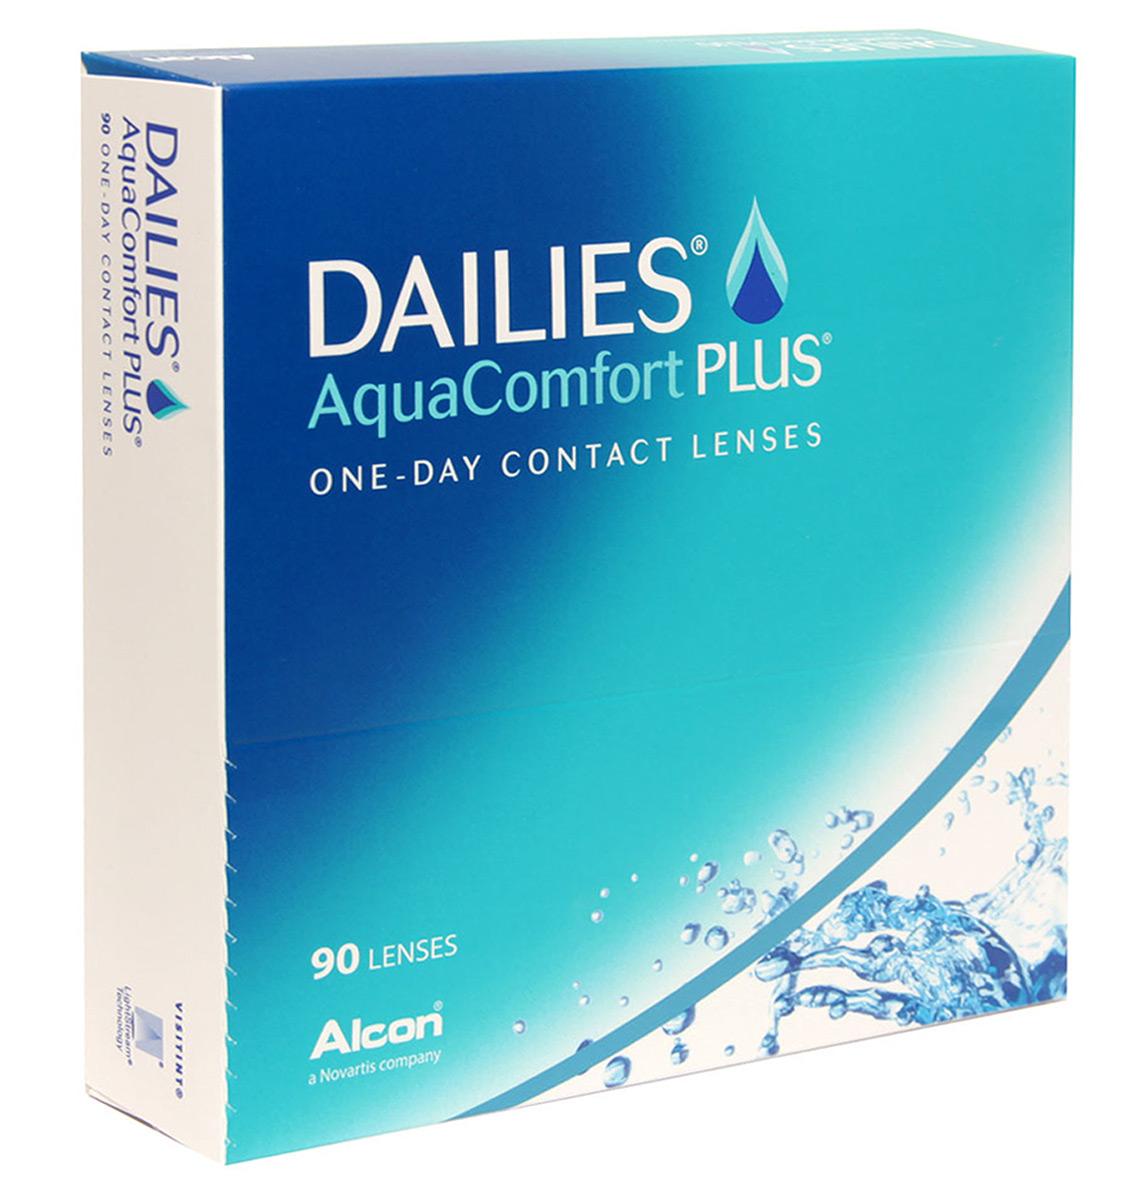 Alcon-CIBA Vision контактные линзы Dailies AquaComfort Plus (90шт / 8.7 / 14.0 / -4.75)